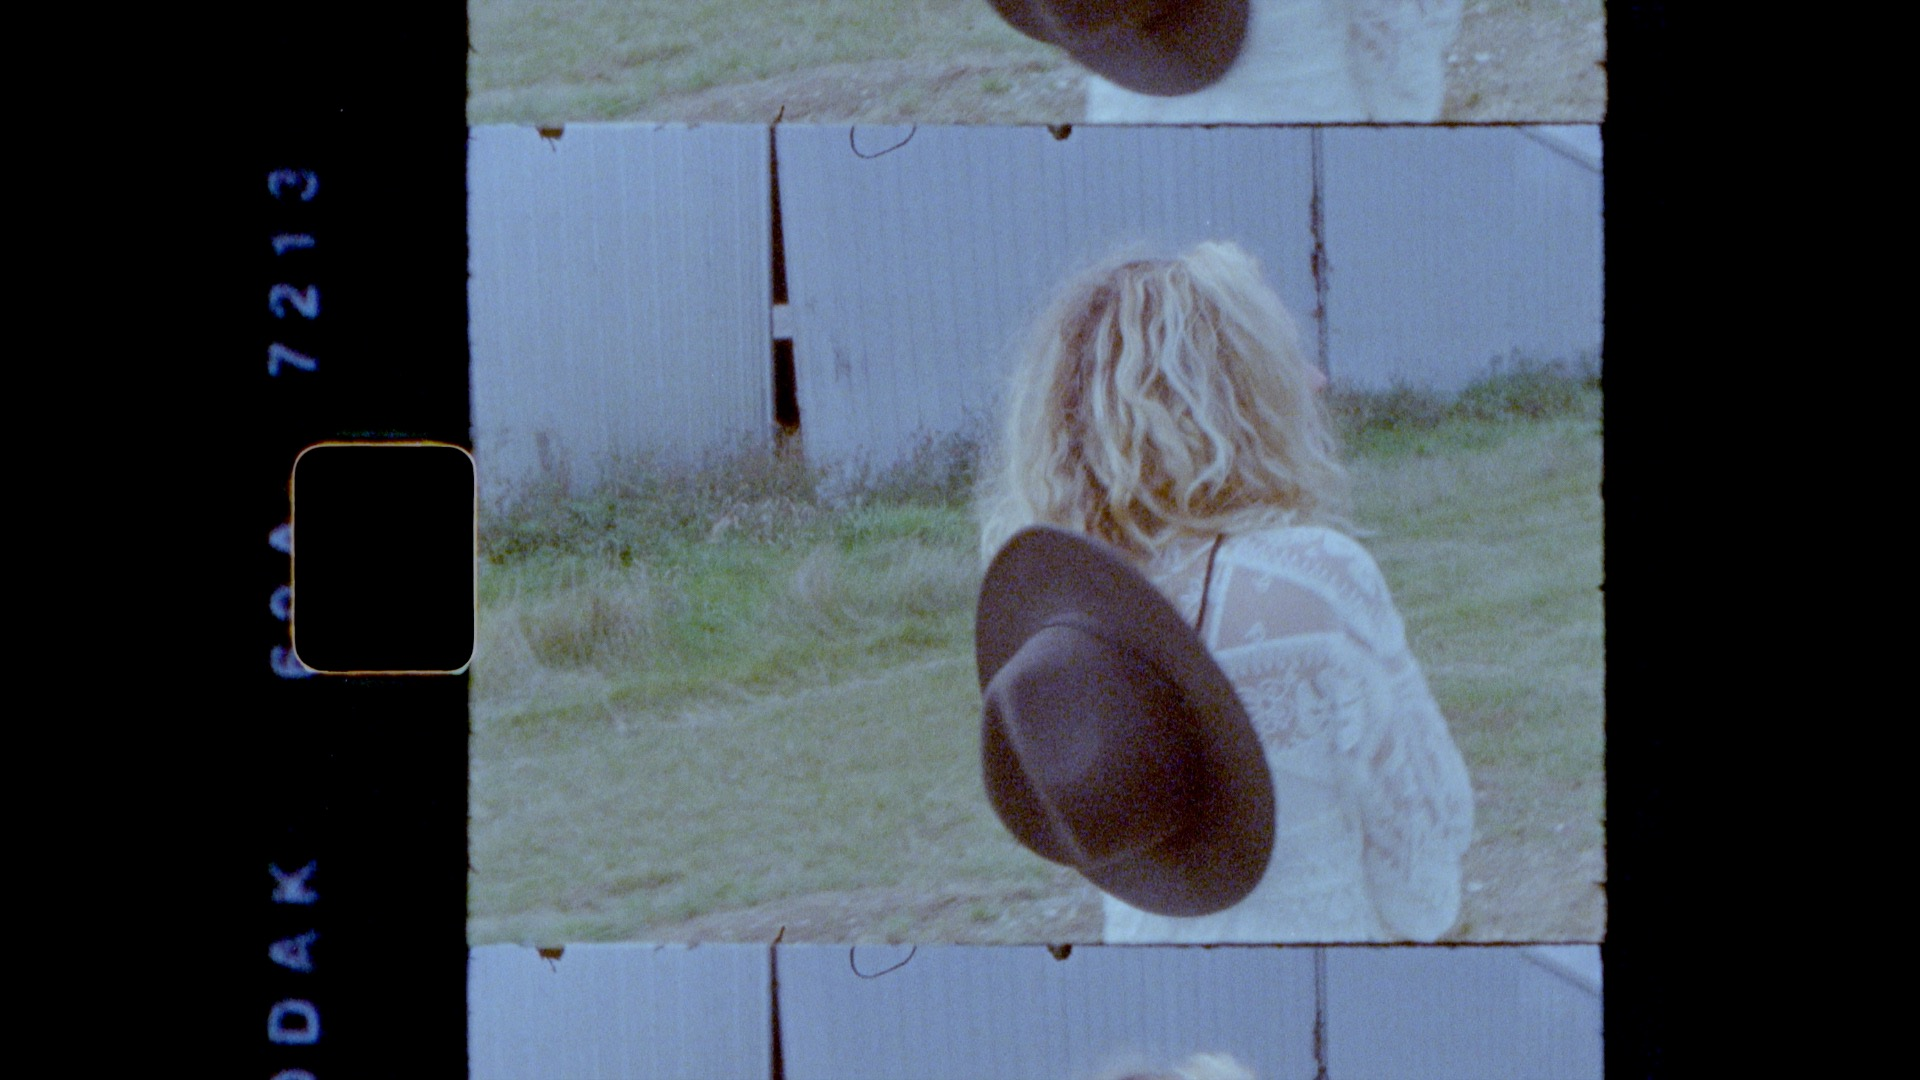 SUPER_8_FILMS1001.JPG